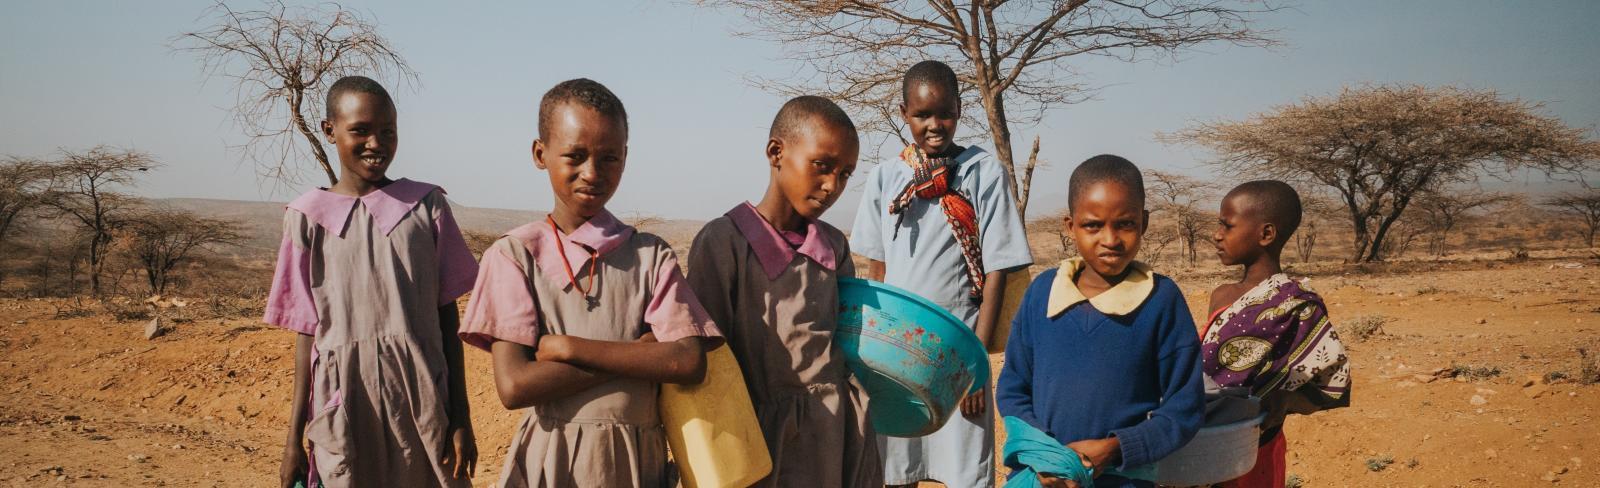 School children in Kenya. Photo by Tucker Tangeman